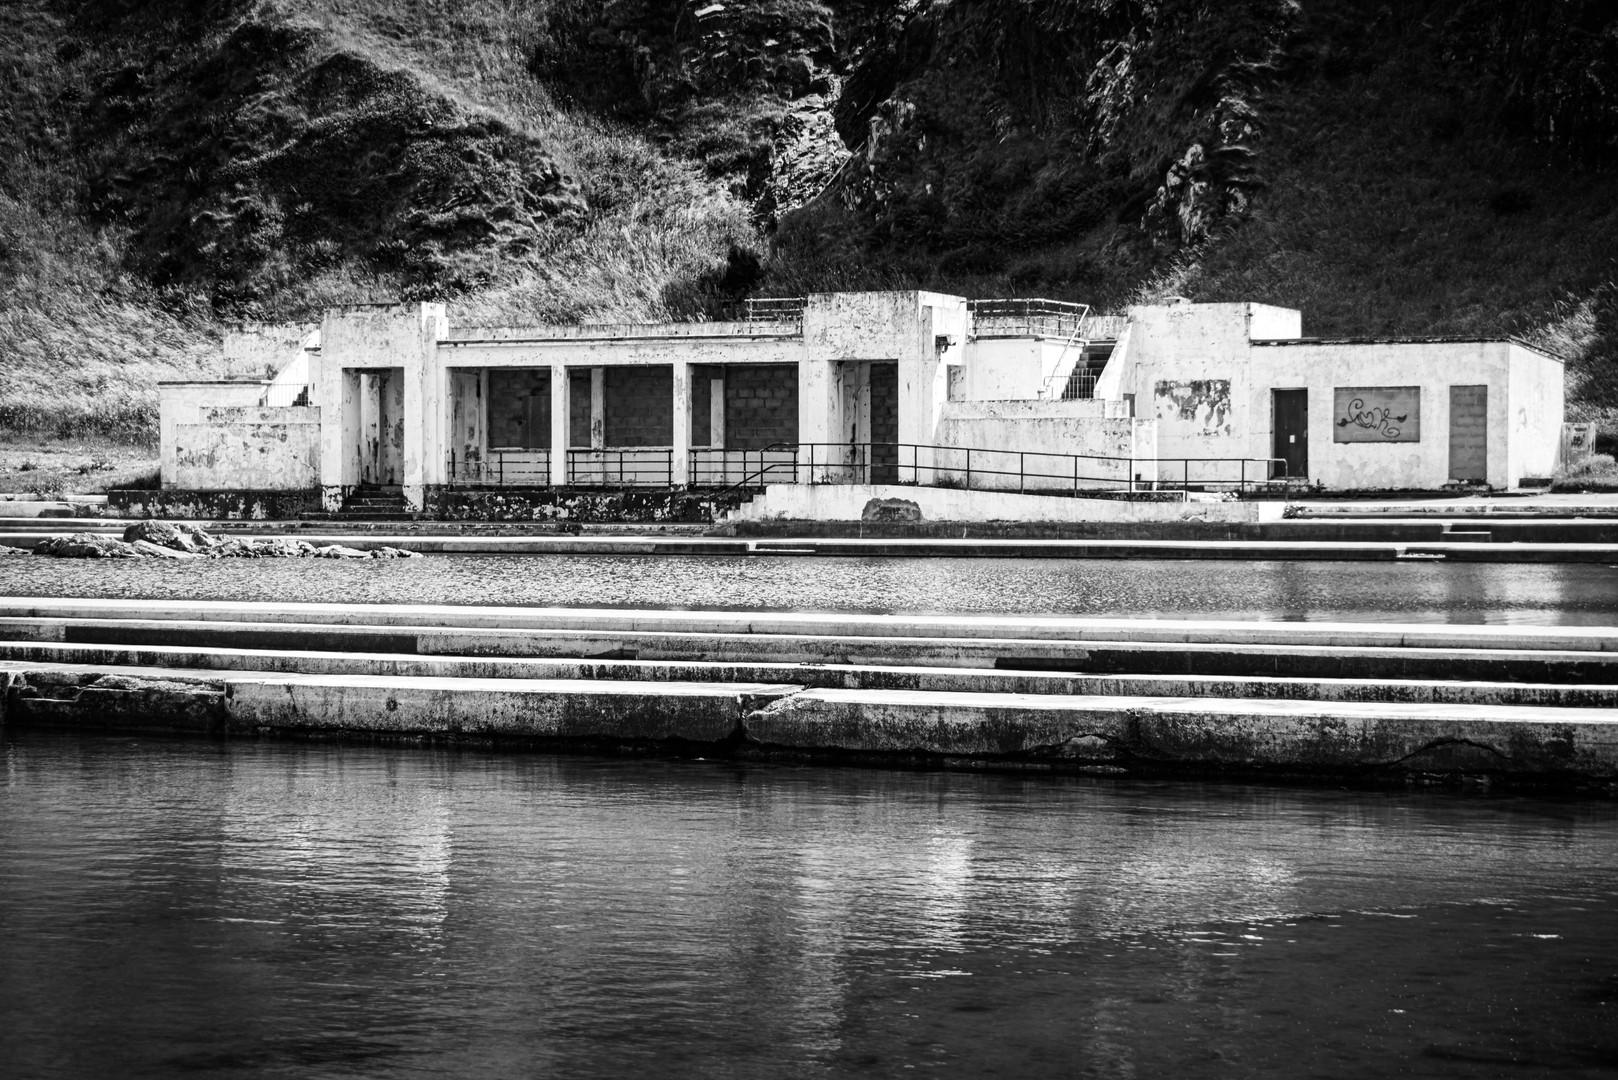 Tarlair Pool, Macduff, Aberdeenshire